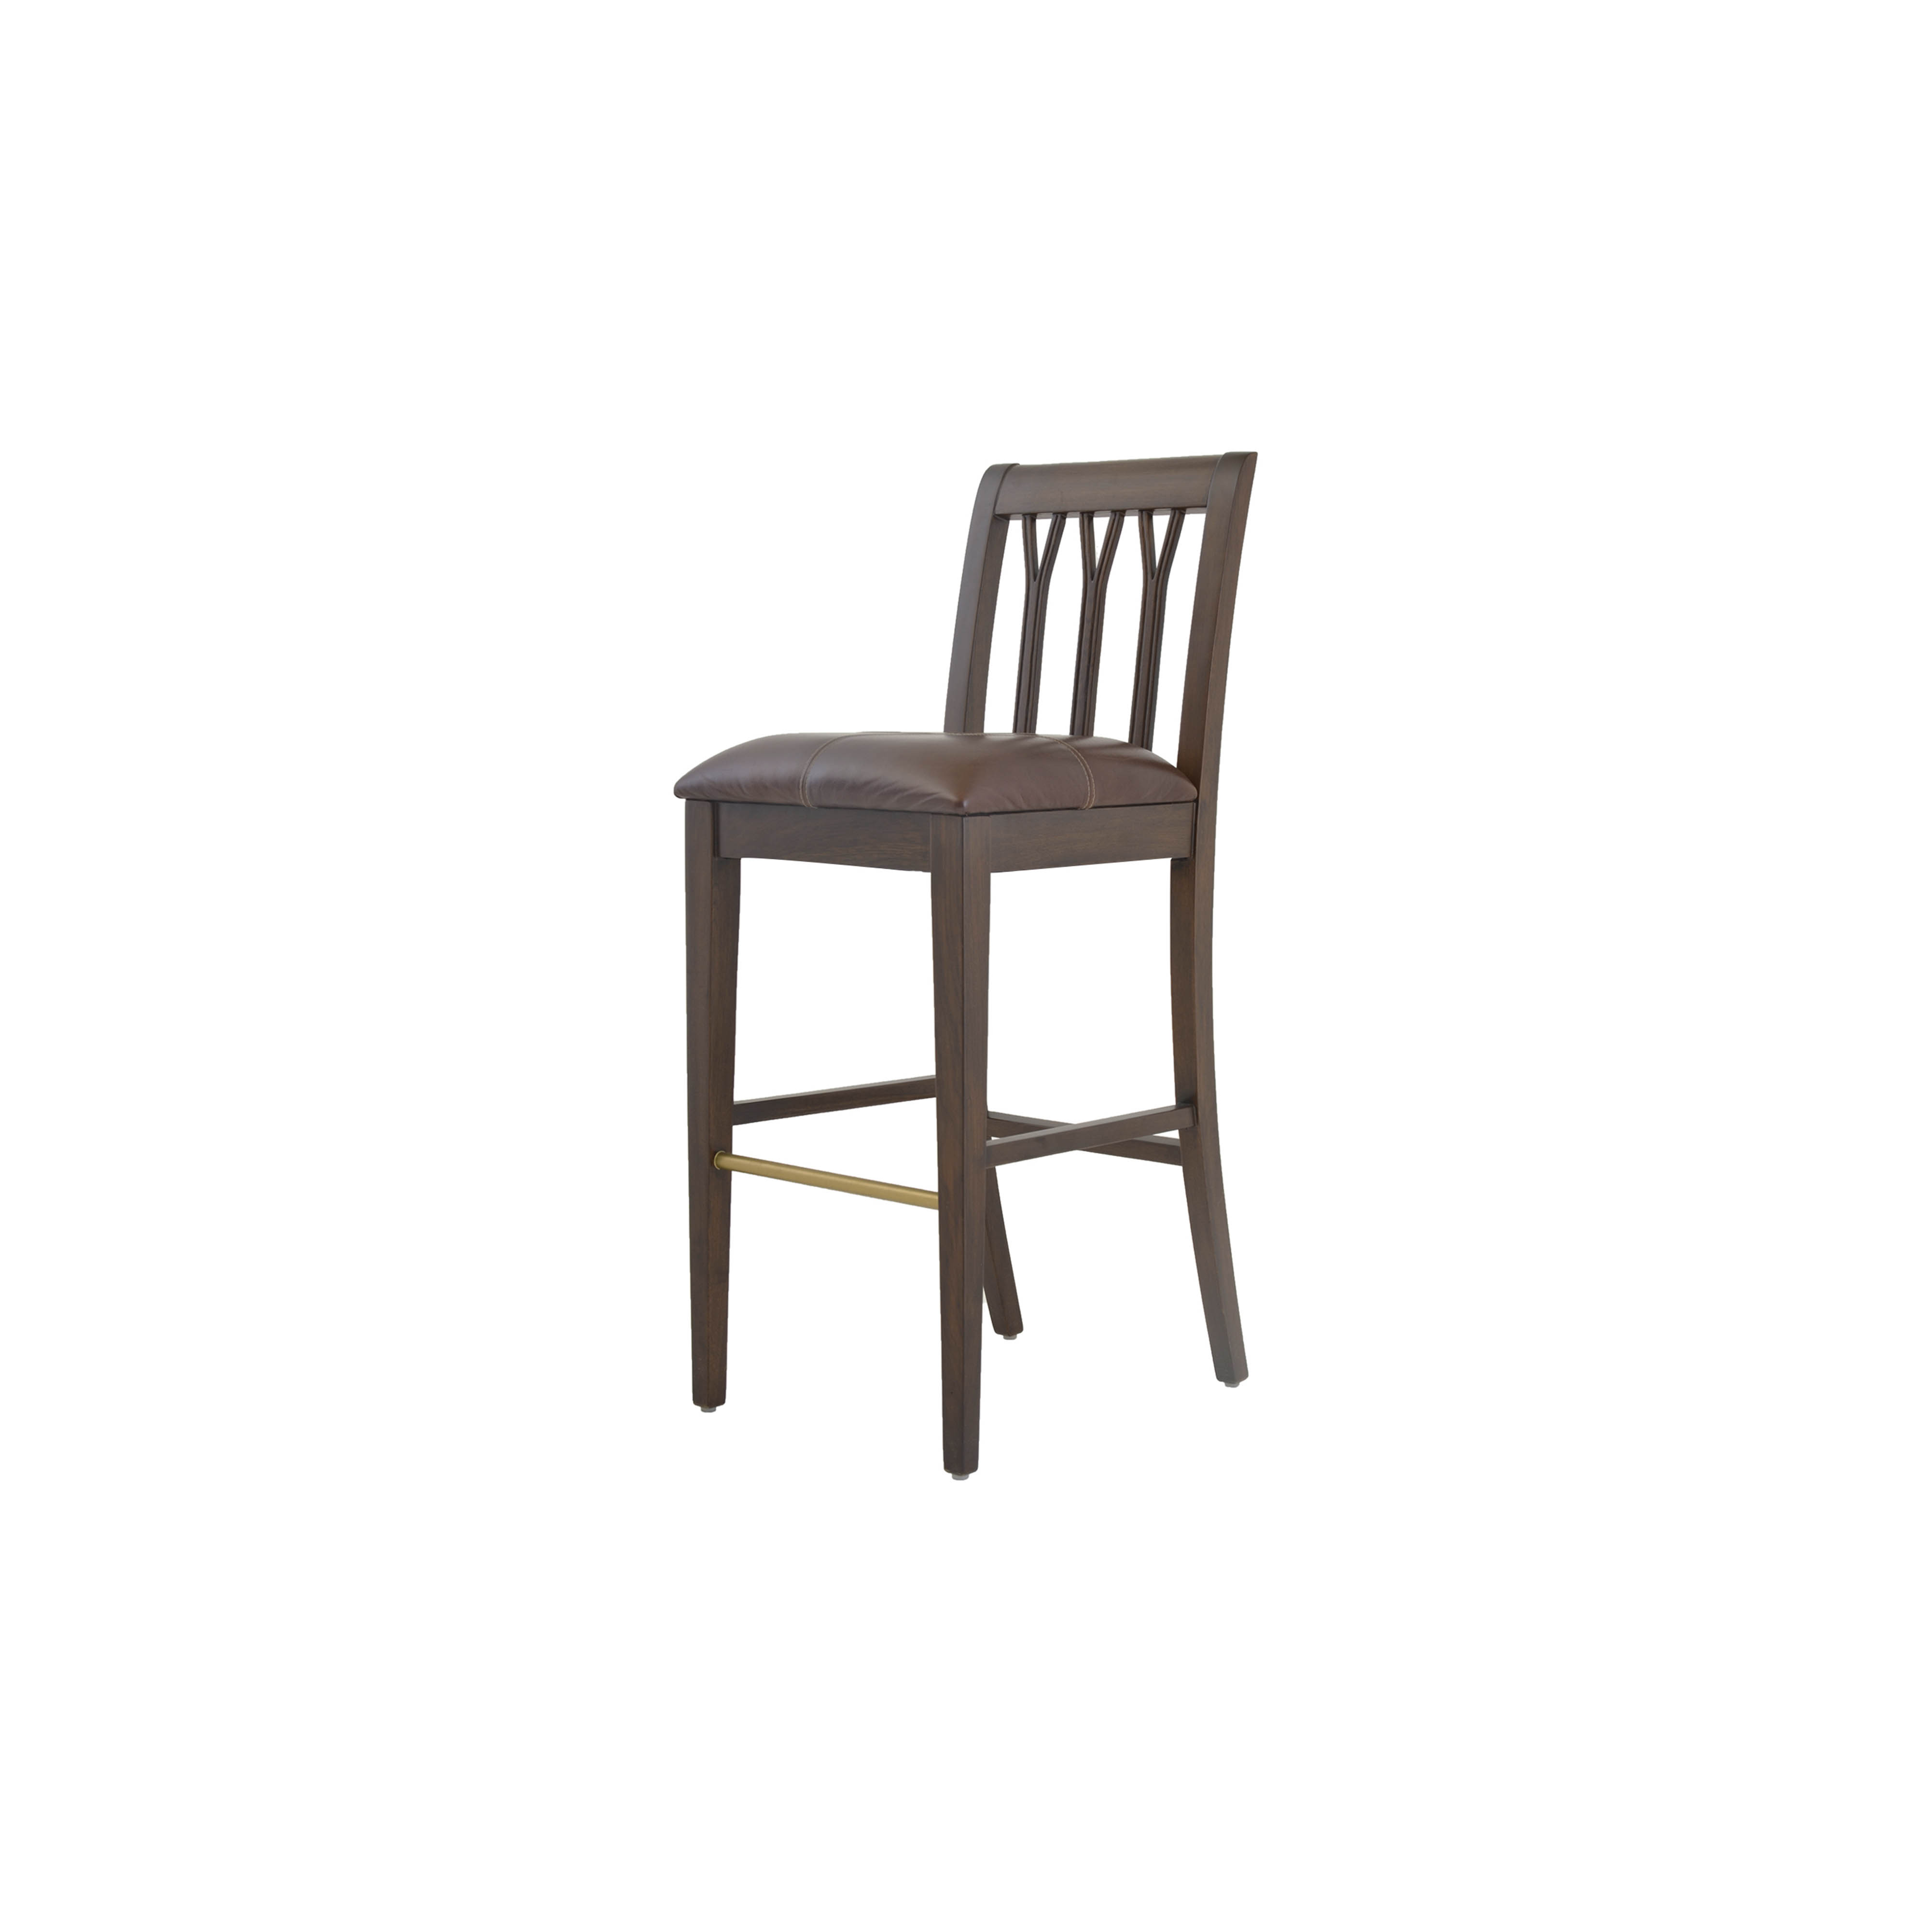 Hackney bar chair